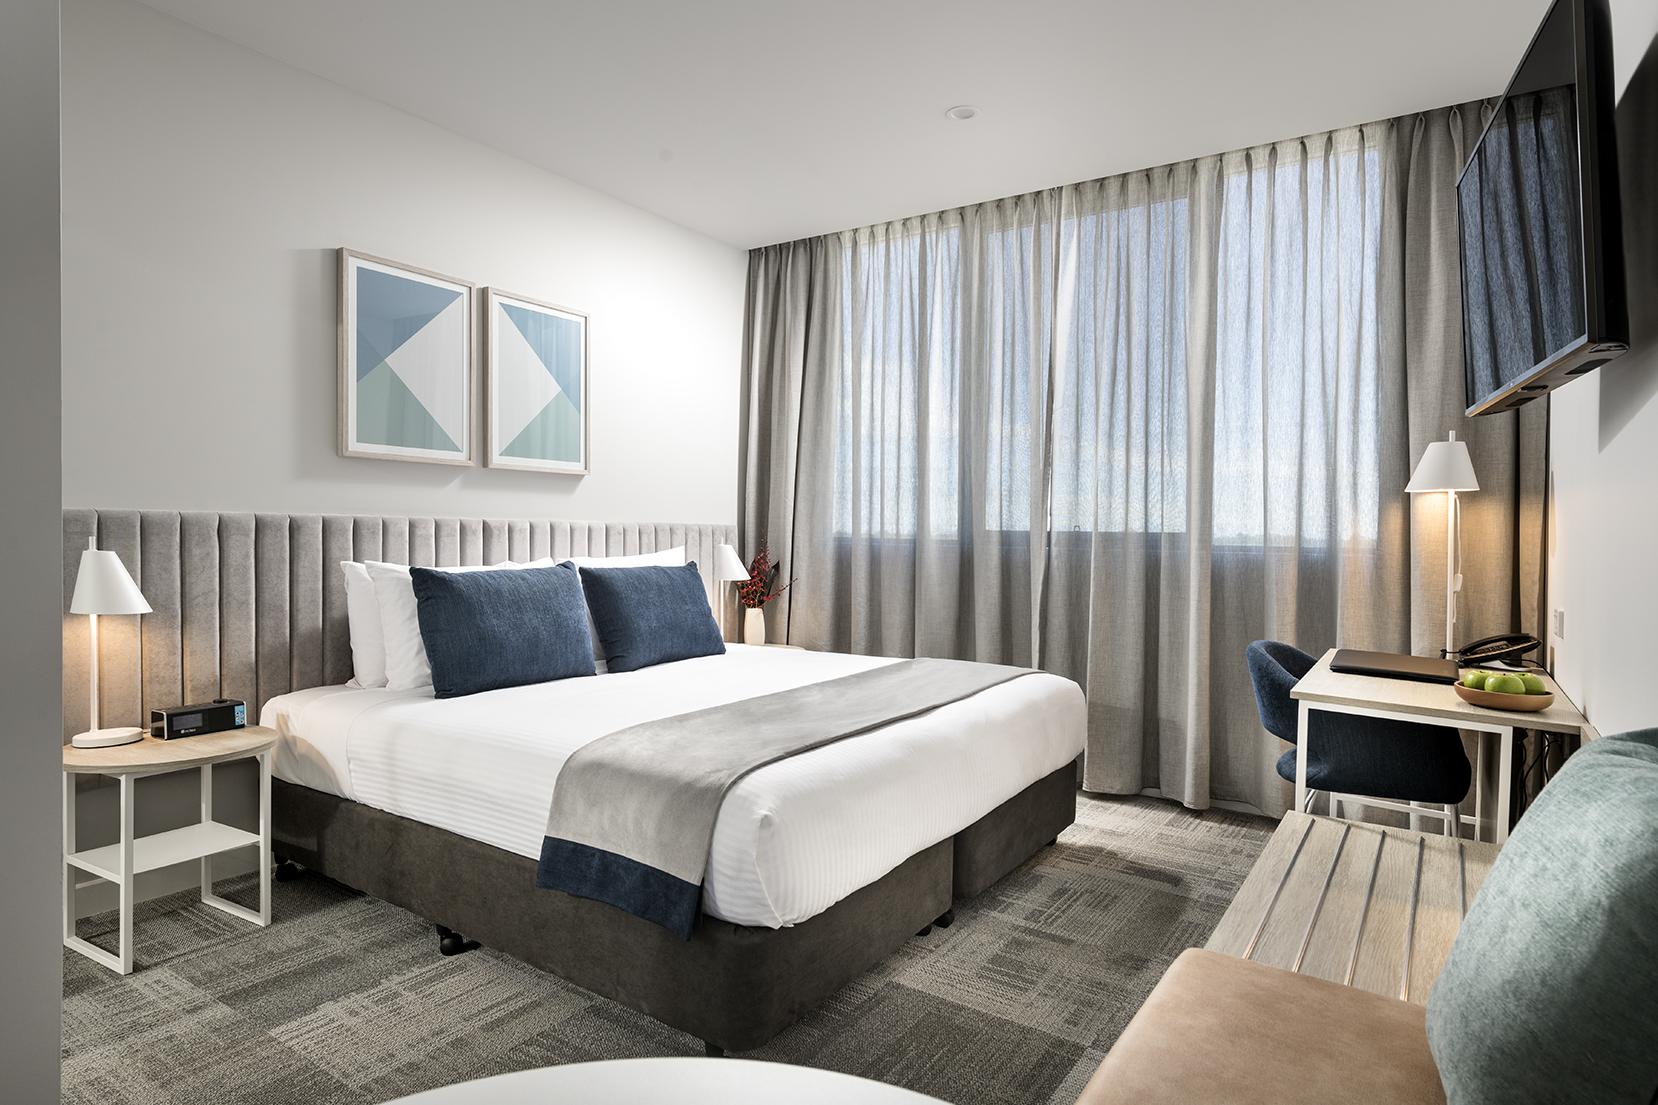 Bedroom at Quest Midland